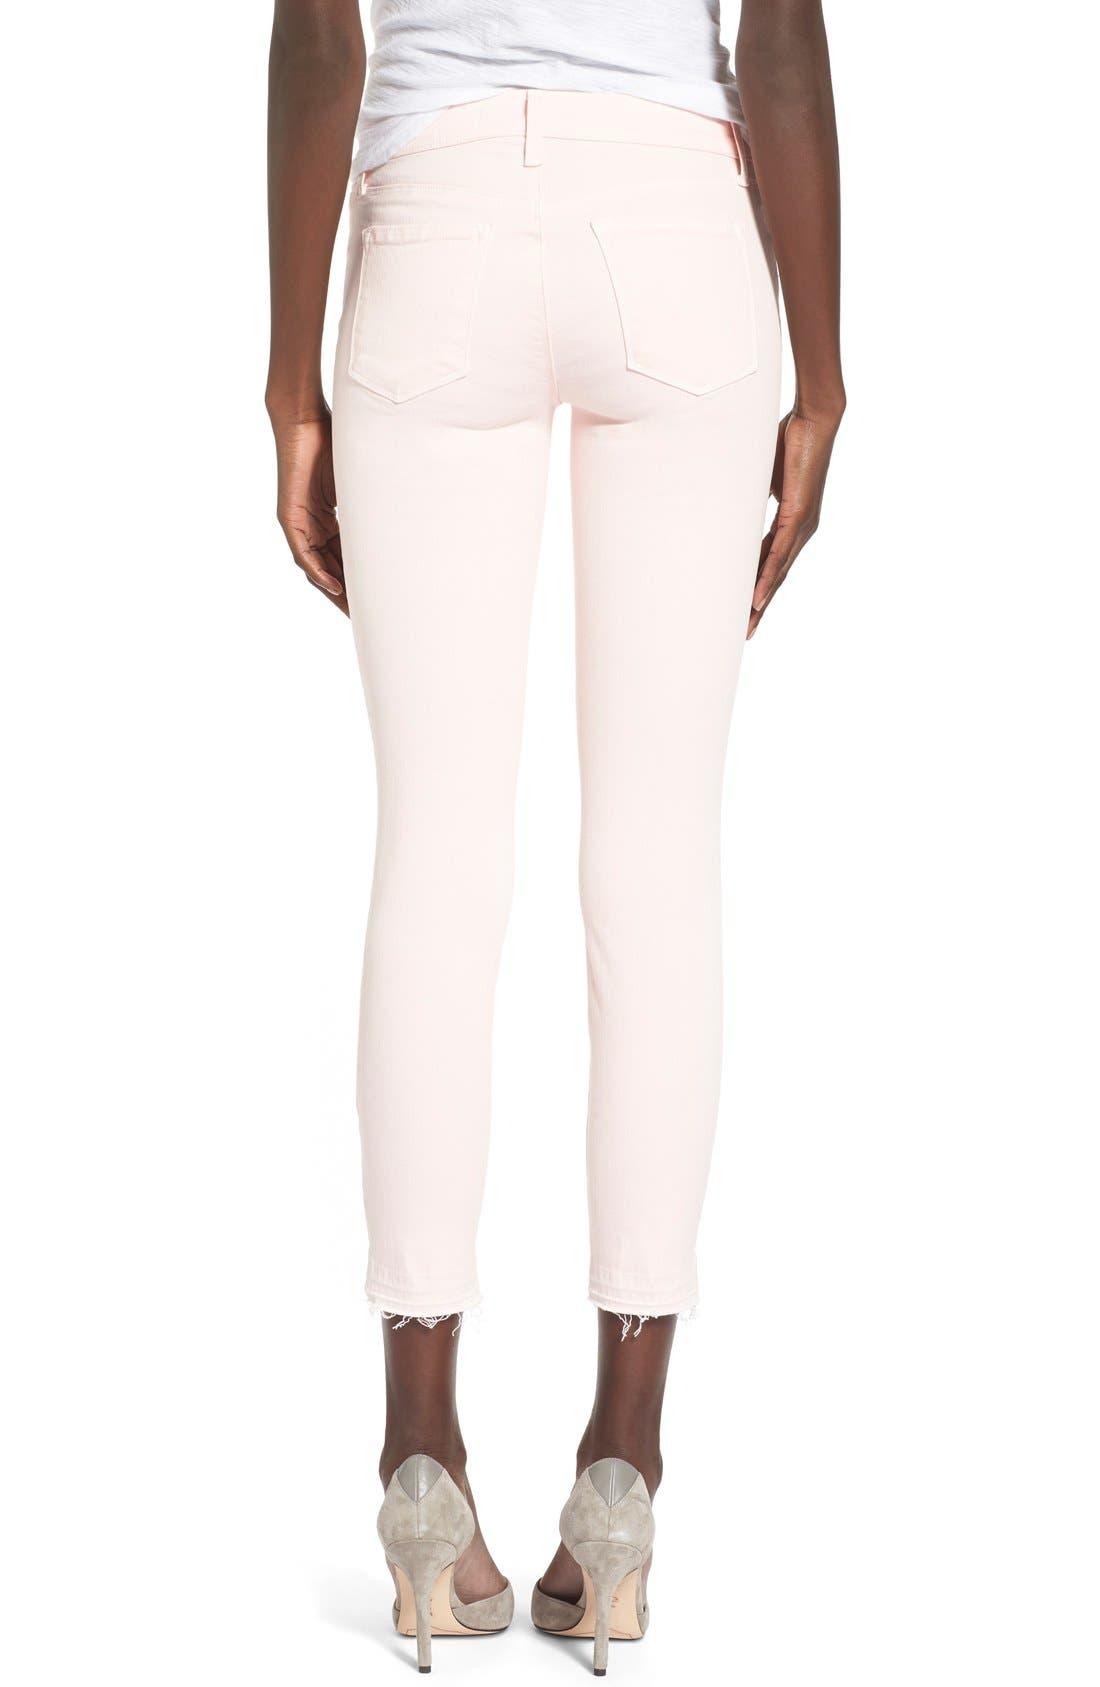 J BRAND,                             'Little Pink Jean' Low RiseCropSkinny Jeans,                             Alternate thumbnail 6, color,                             650